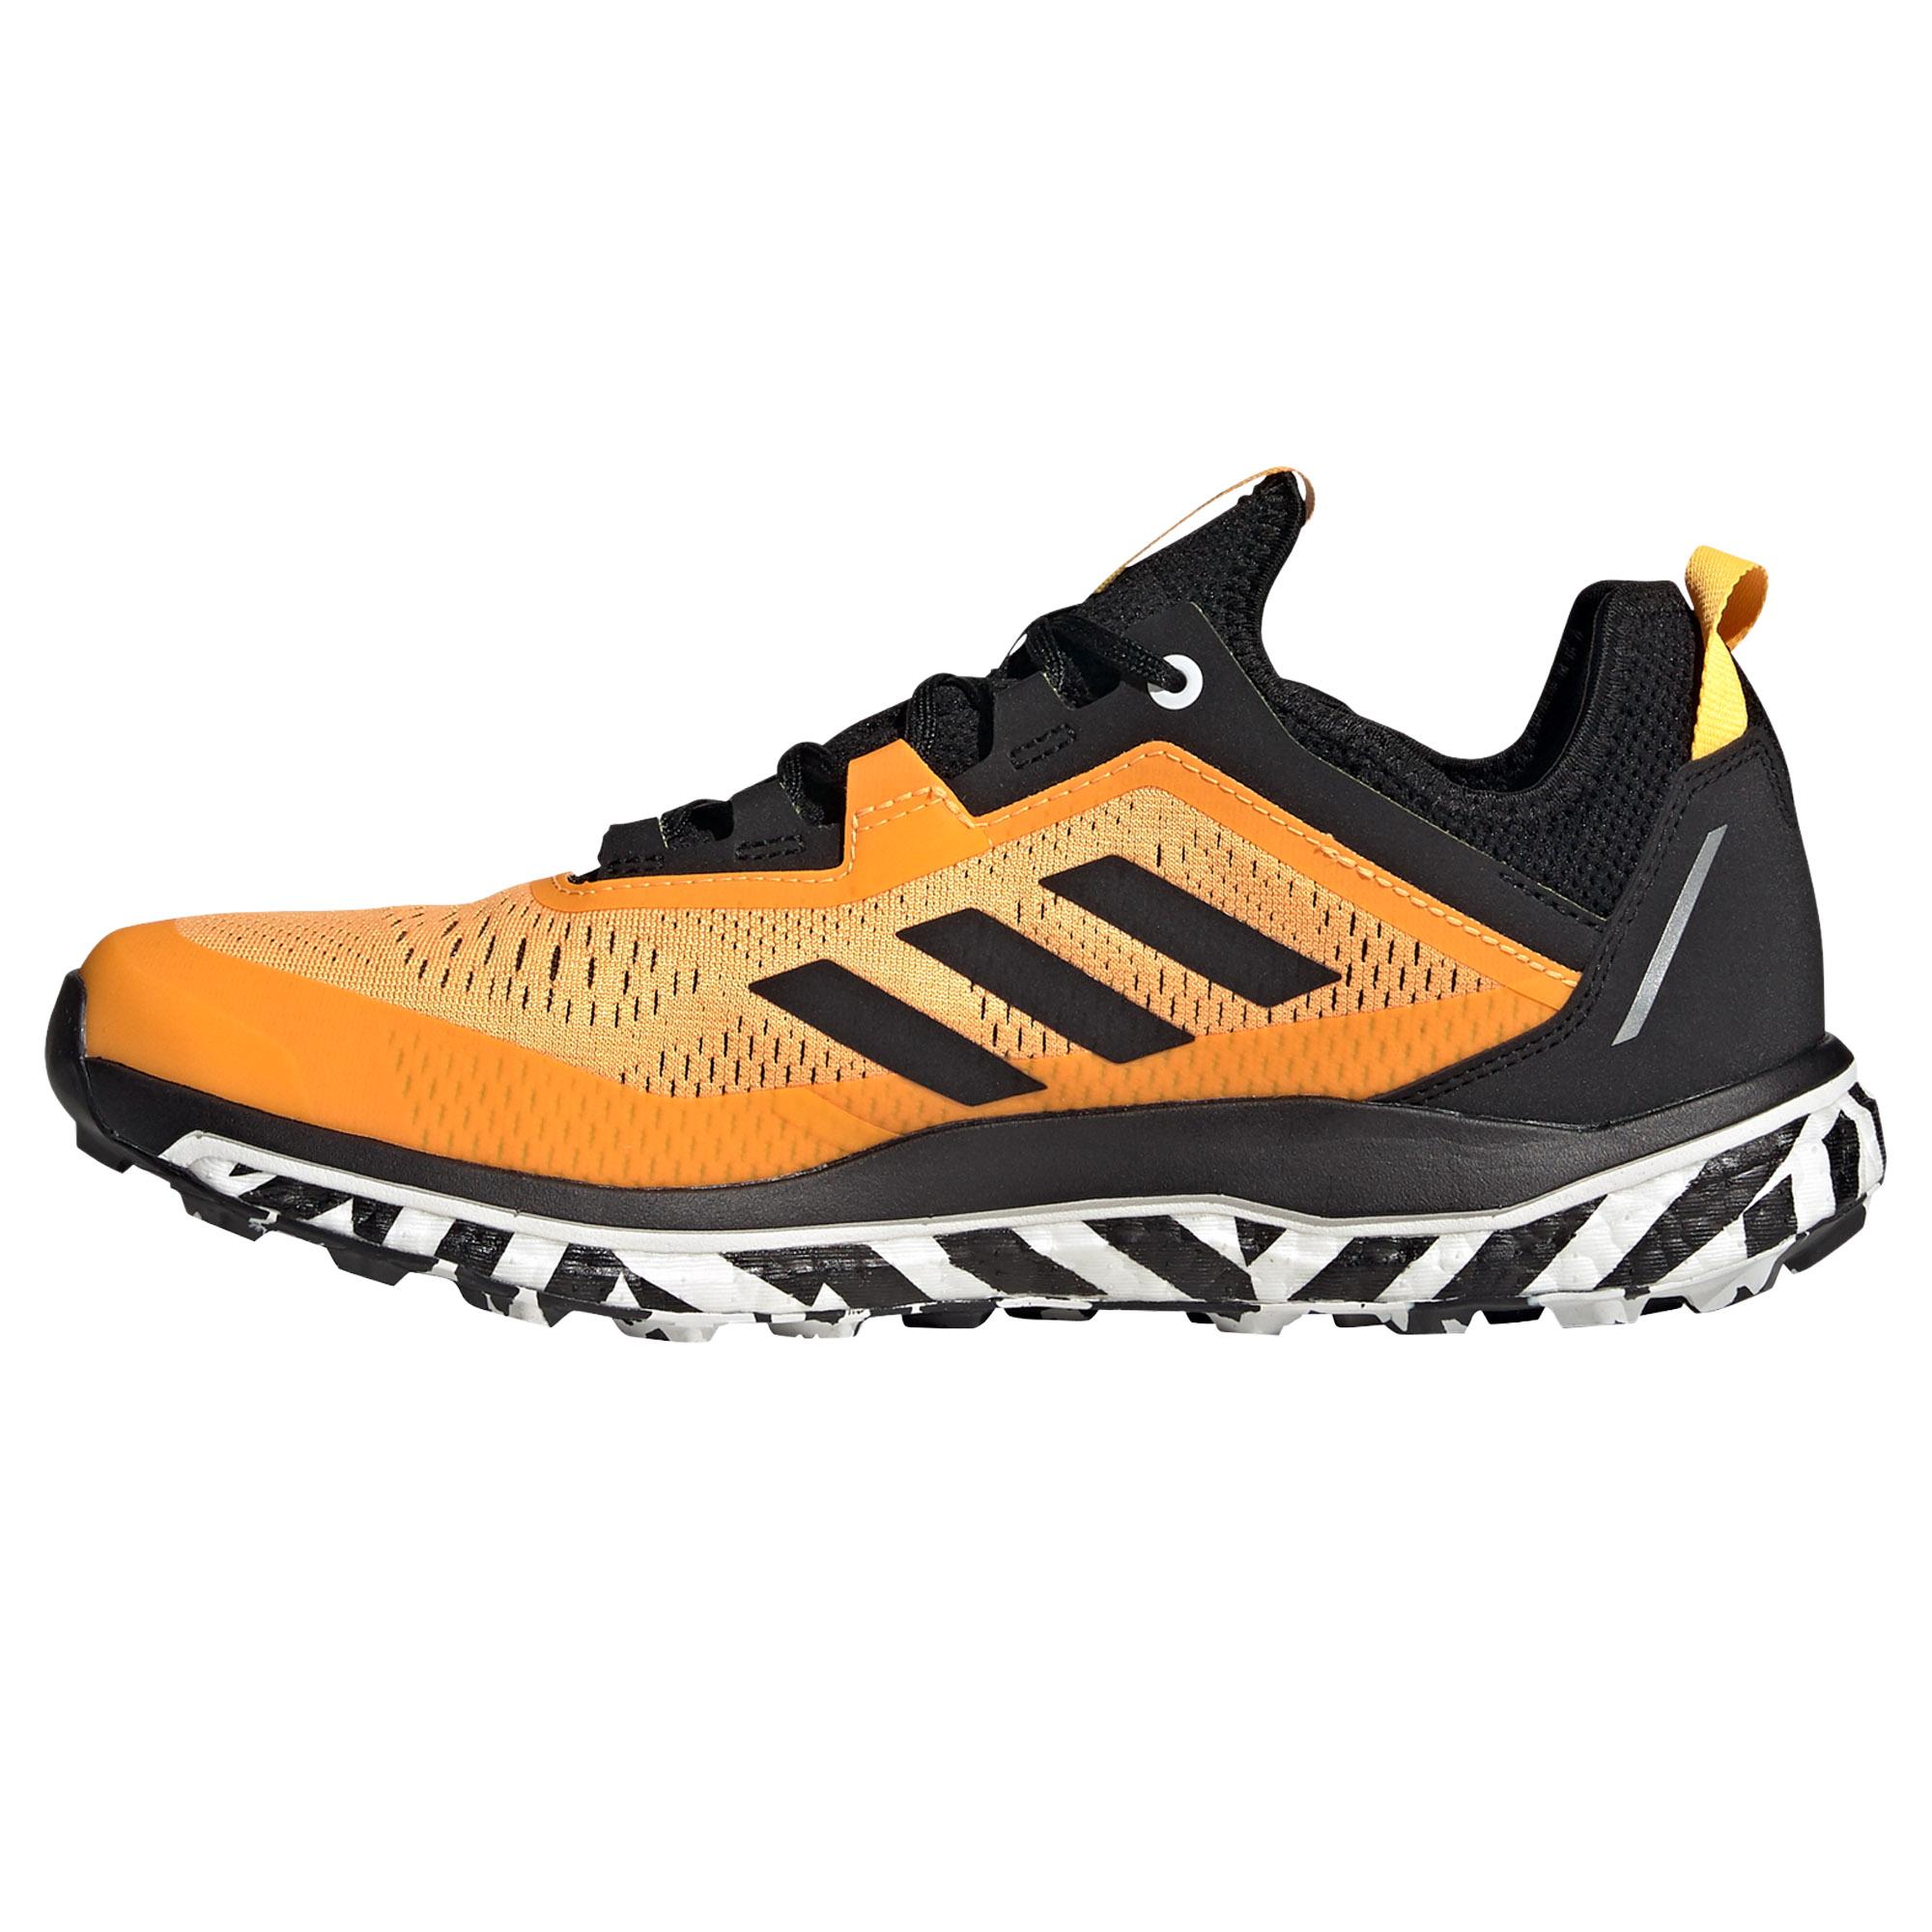 miniatura 8 - ADIDAS Terrex di Flusso Da Uomo Scarpa Trail Running Scarpe da ginnastica Arancione/Nero